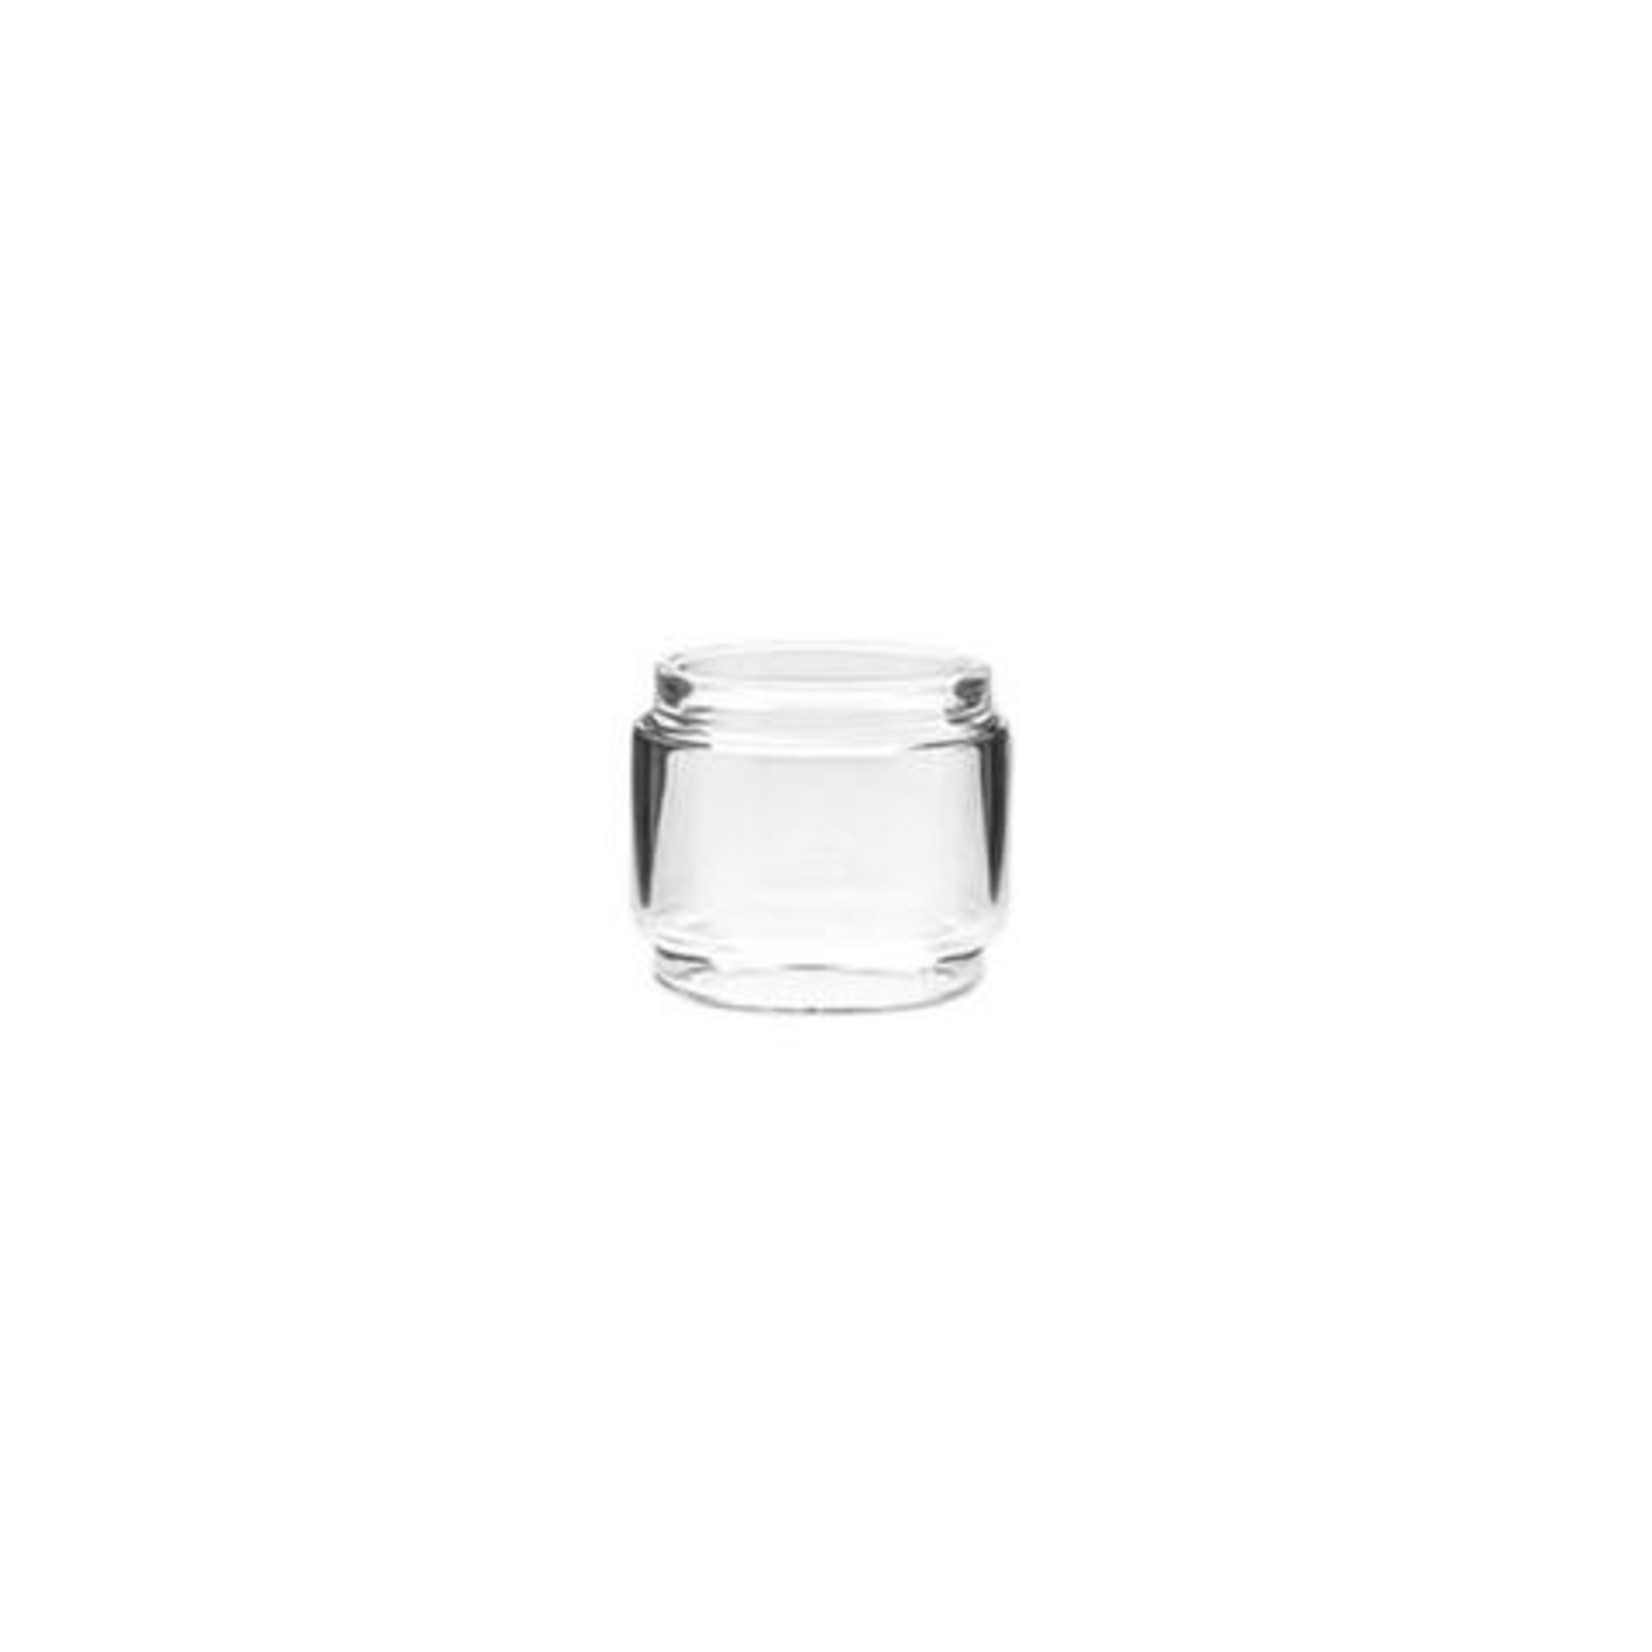 Uwell Valyrian 2 Bulb Glass 6ml